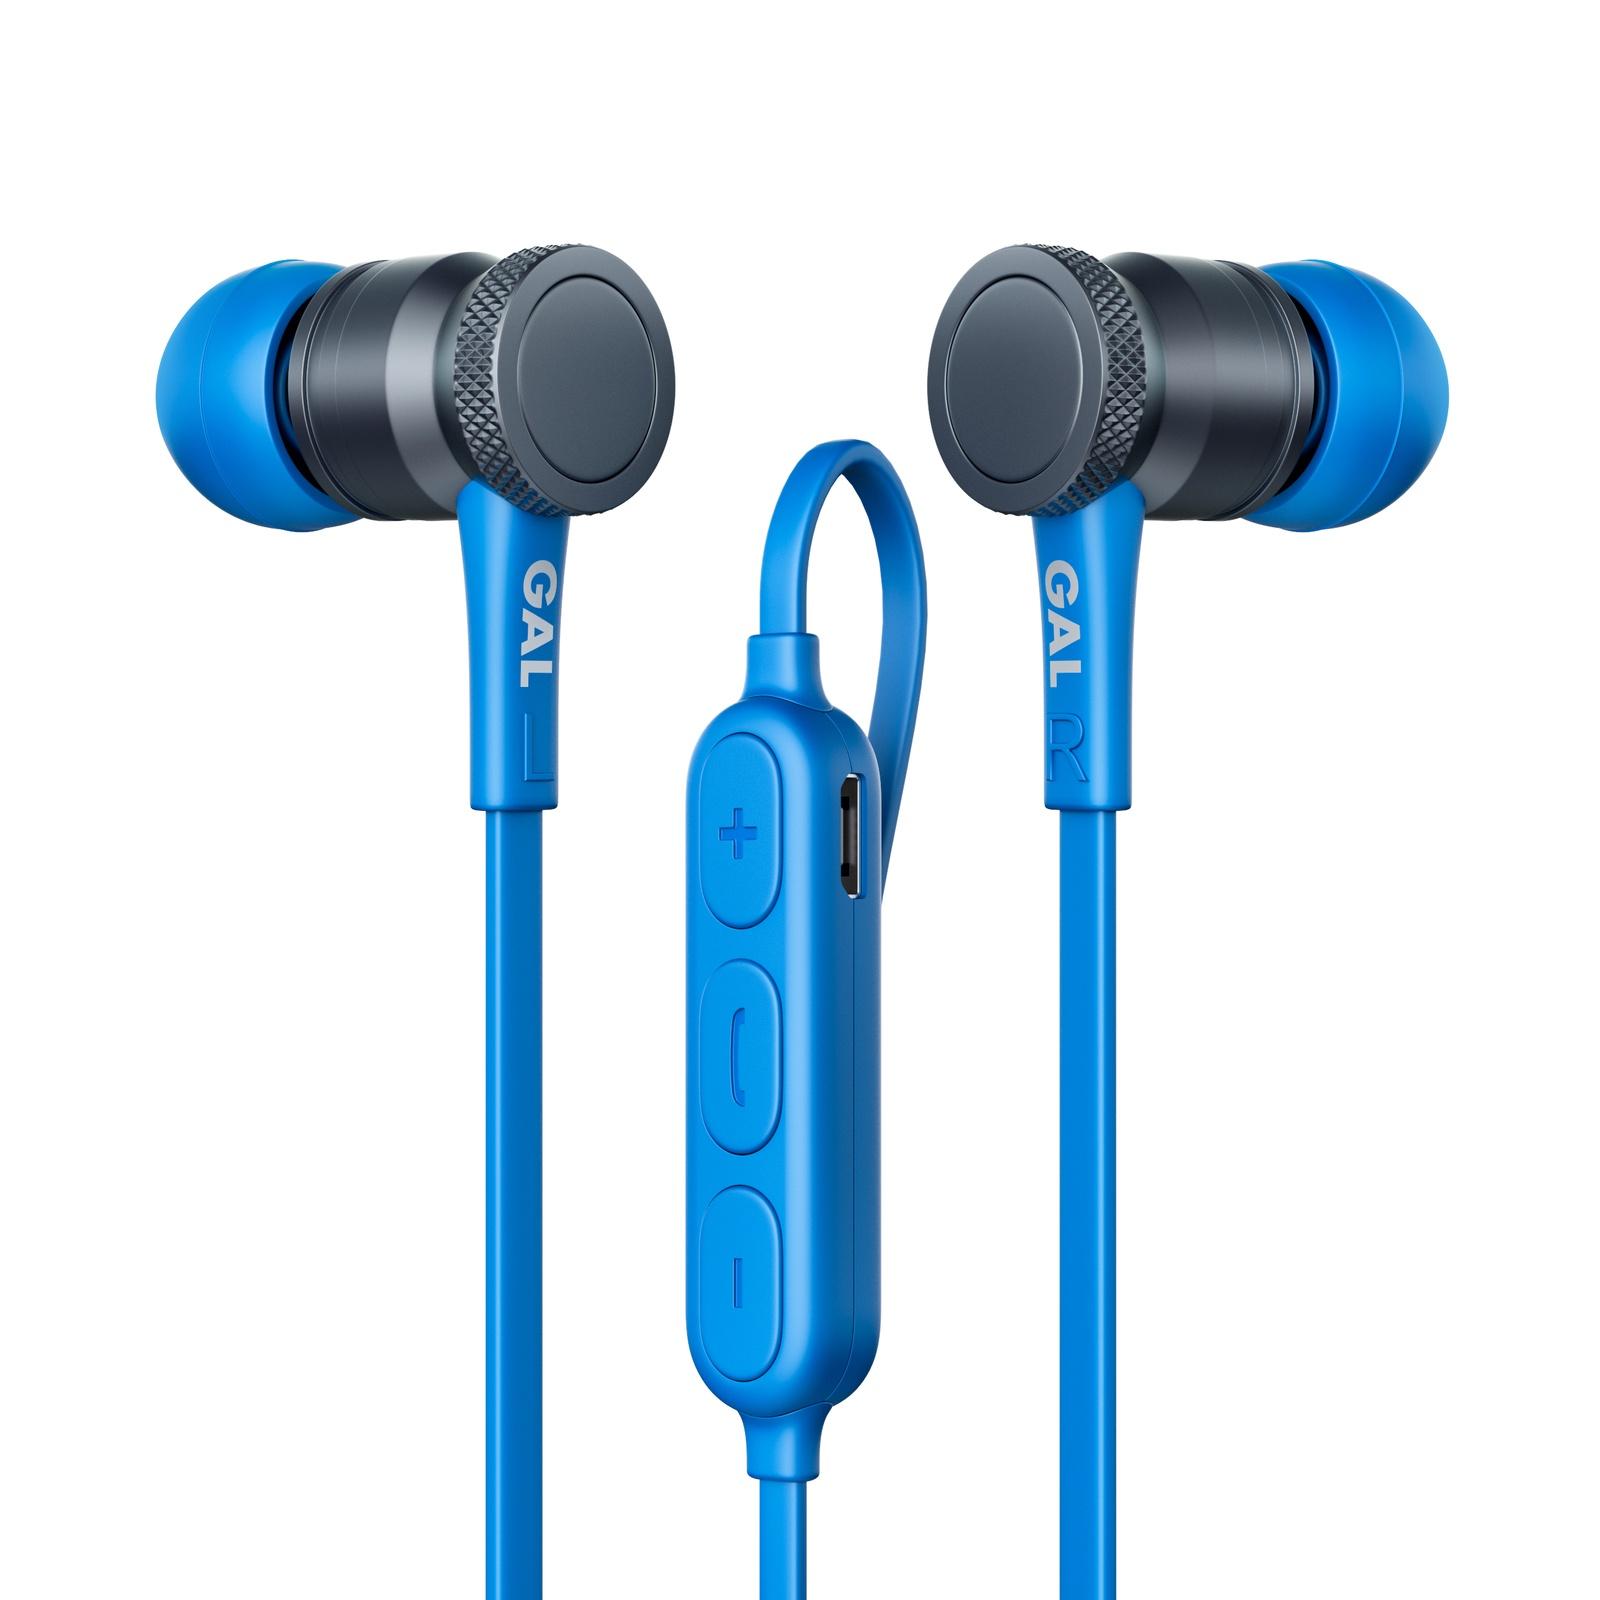 Наушники GAL BH-2004BL vjjb k4 k4s wooden super bass in ear earbuds ebony earphone diy magic sound mic super bass headset for phone ios android mp3